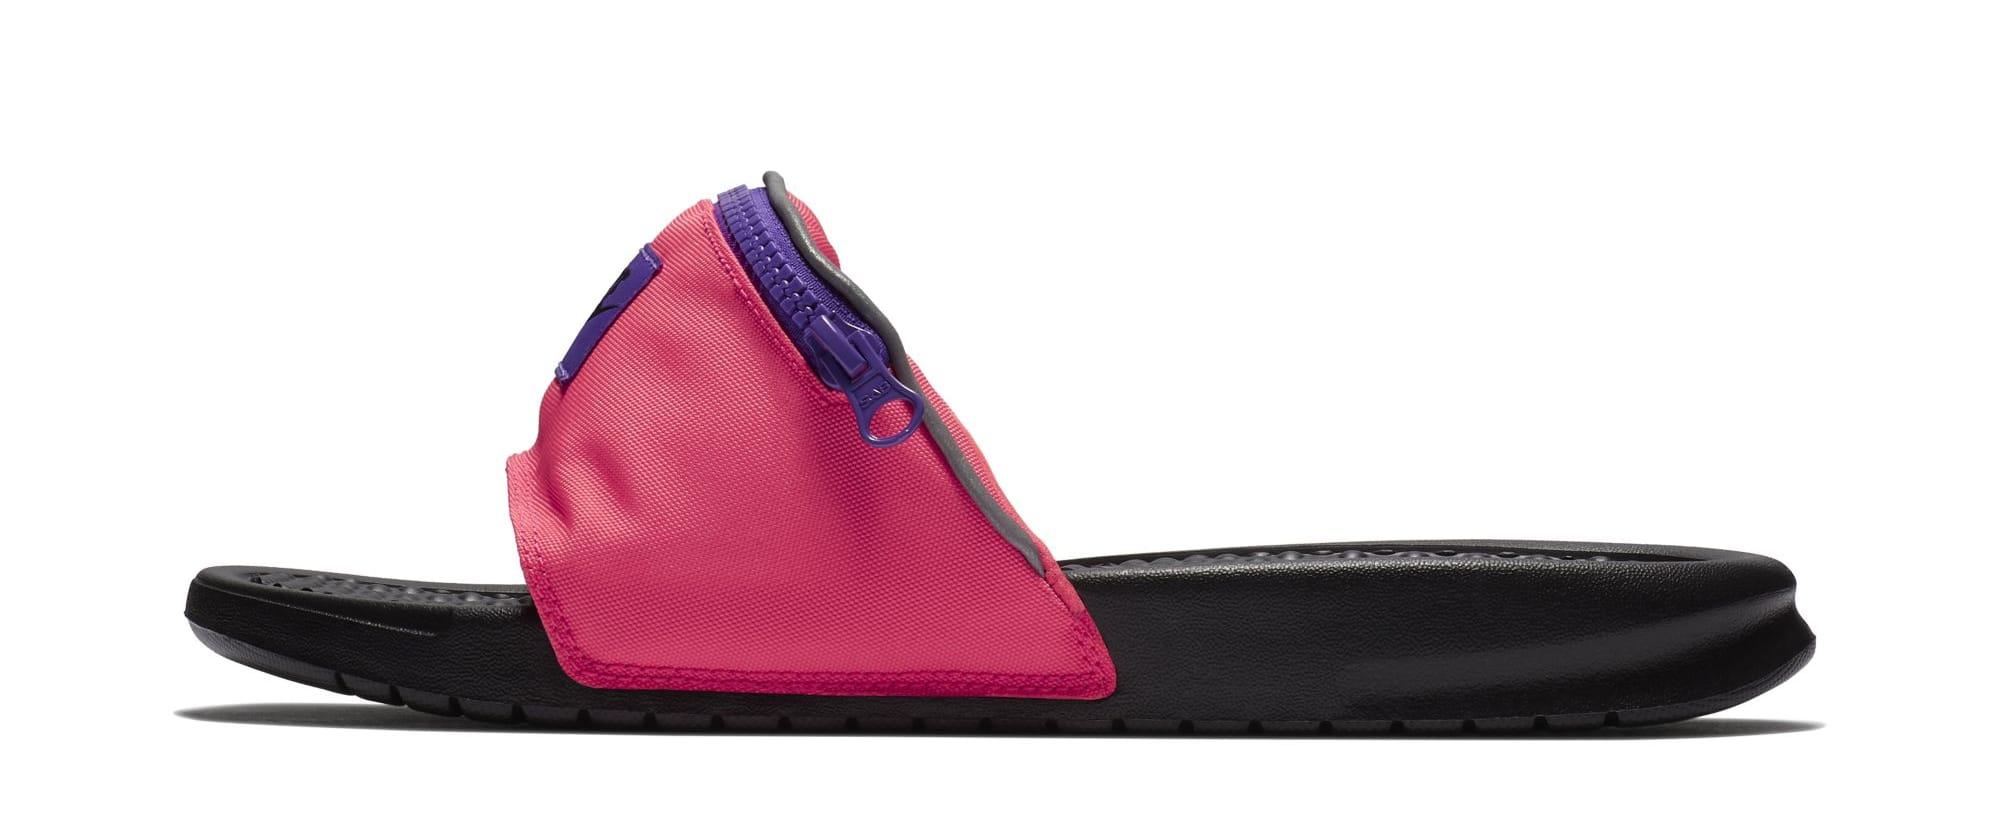 Nike Benassi JDI 'Fanny Pack' Black/Pink (Lateral)